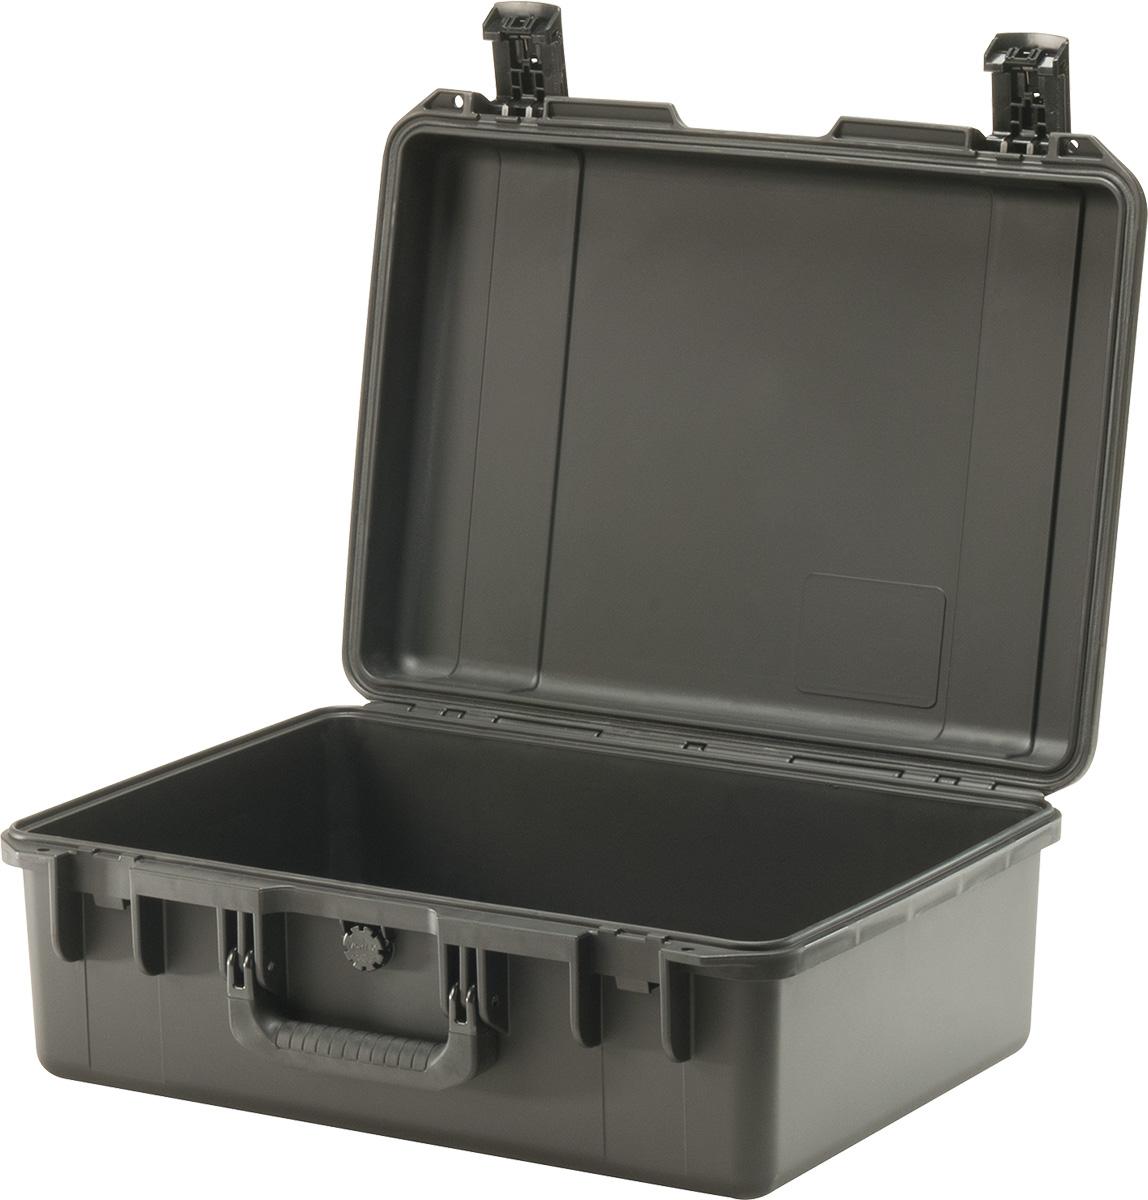 pelican im2600 pelican im2600 watertight hard case im2600